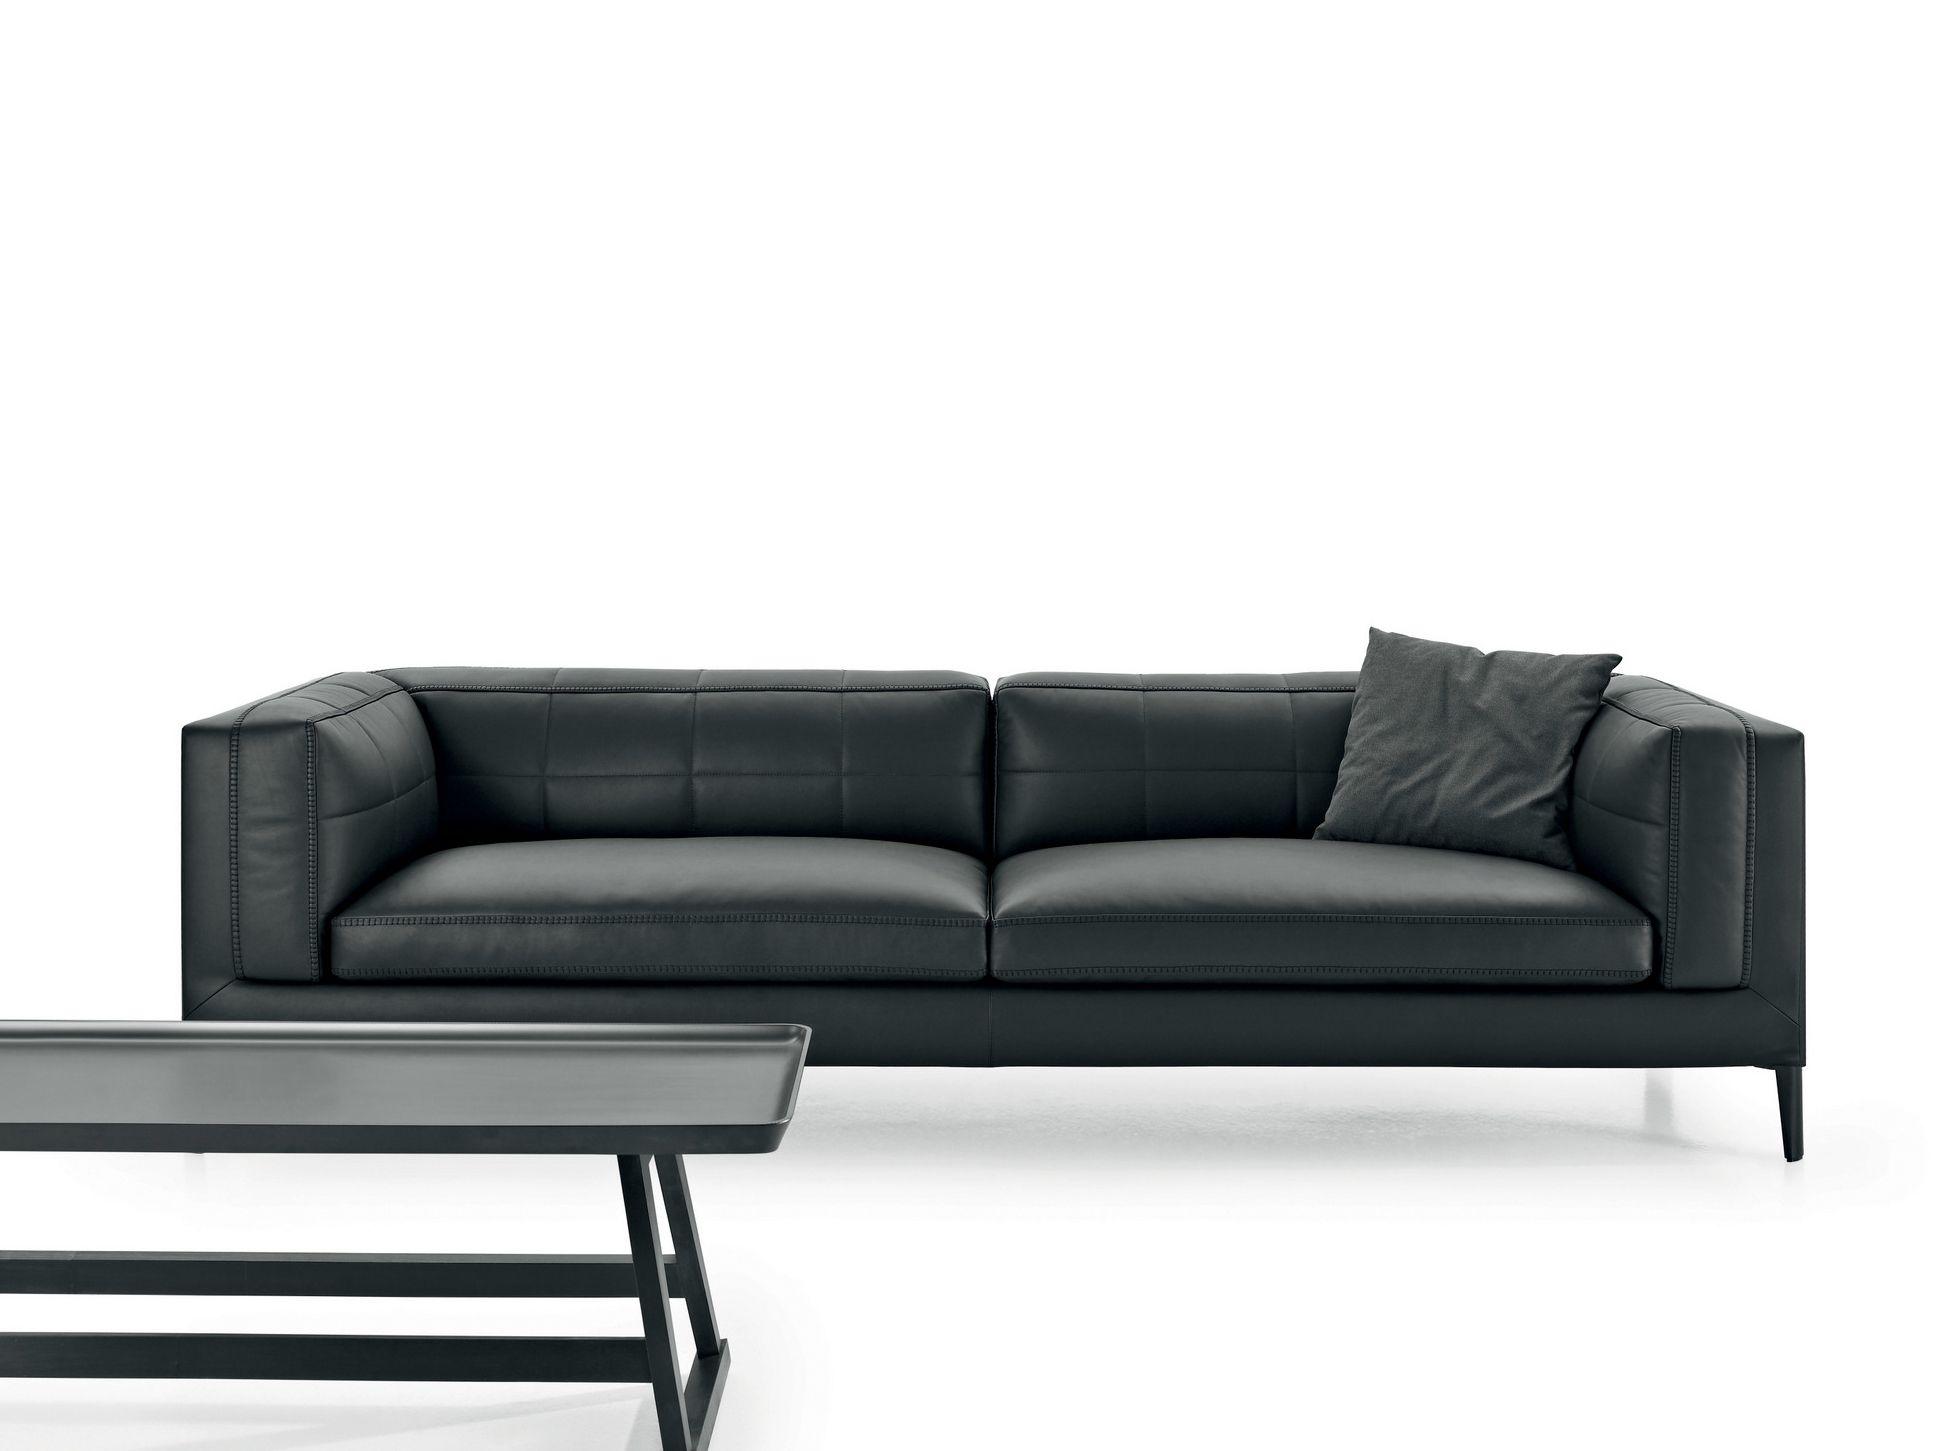 DIVES Sofa by Maxalto, a brand of B